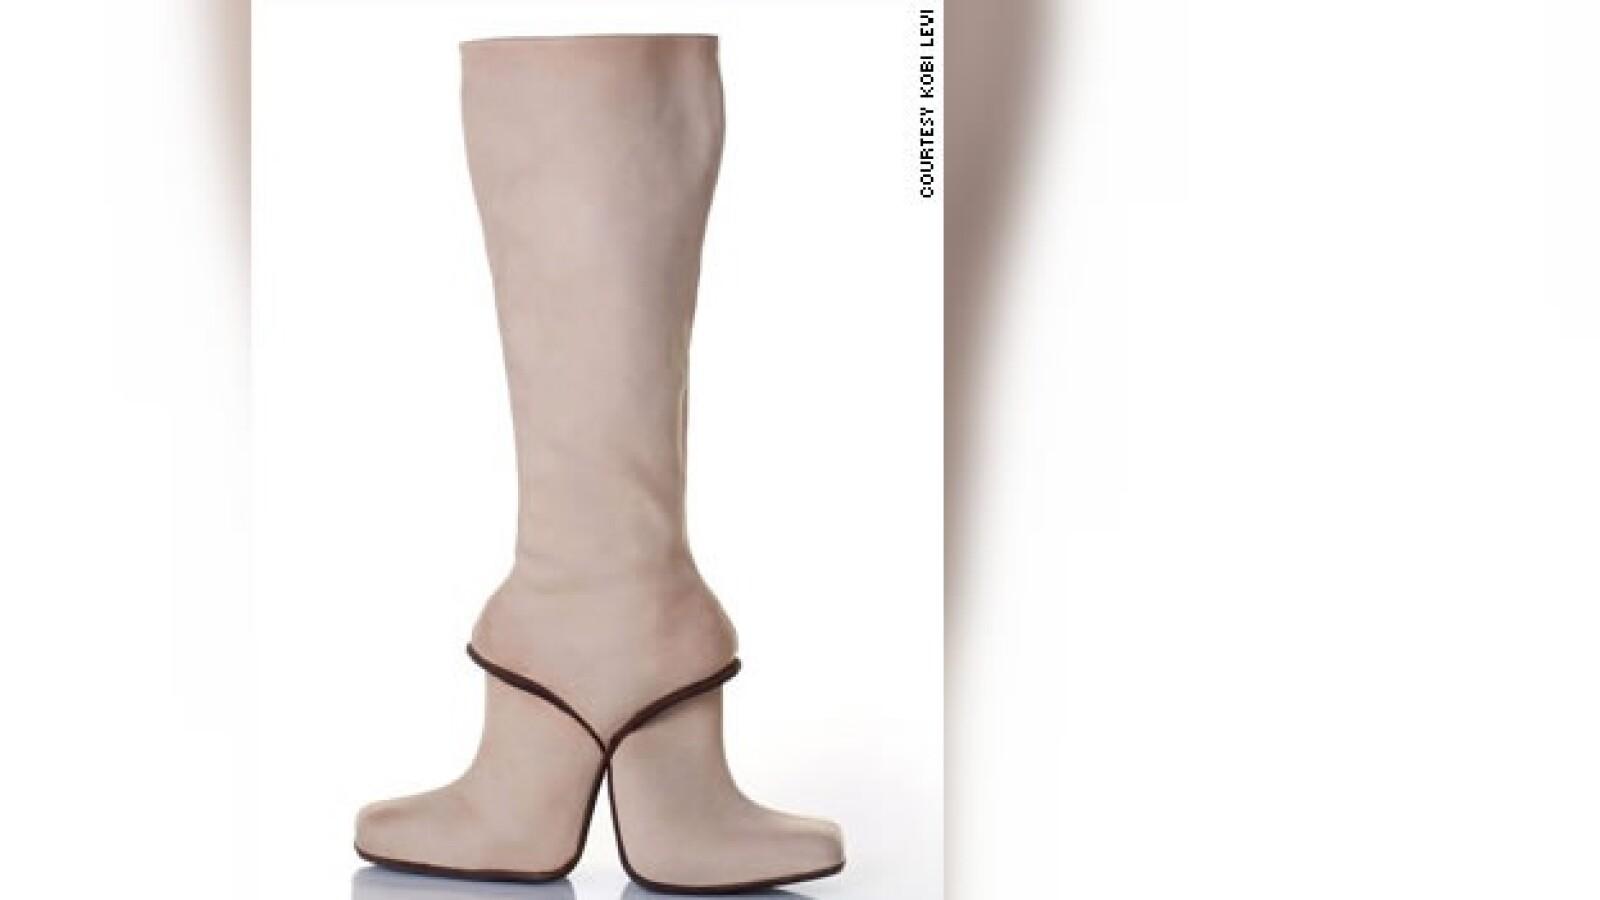 ZapatosArteTrece